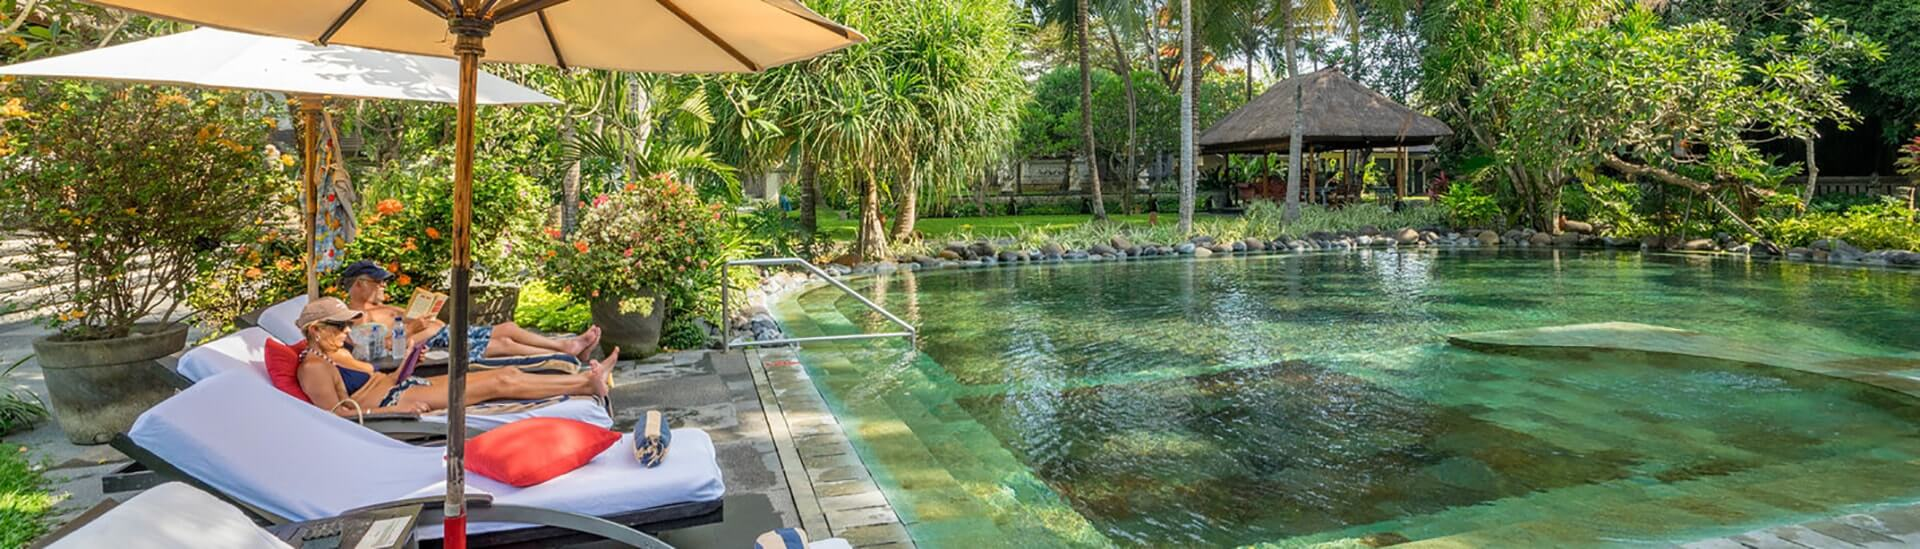 Segara Village Hotel Sanur Bali Indonesia Asia Senses Travel